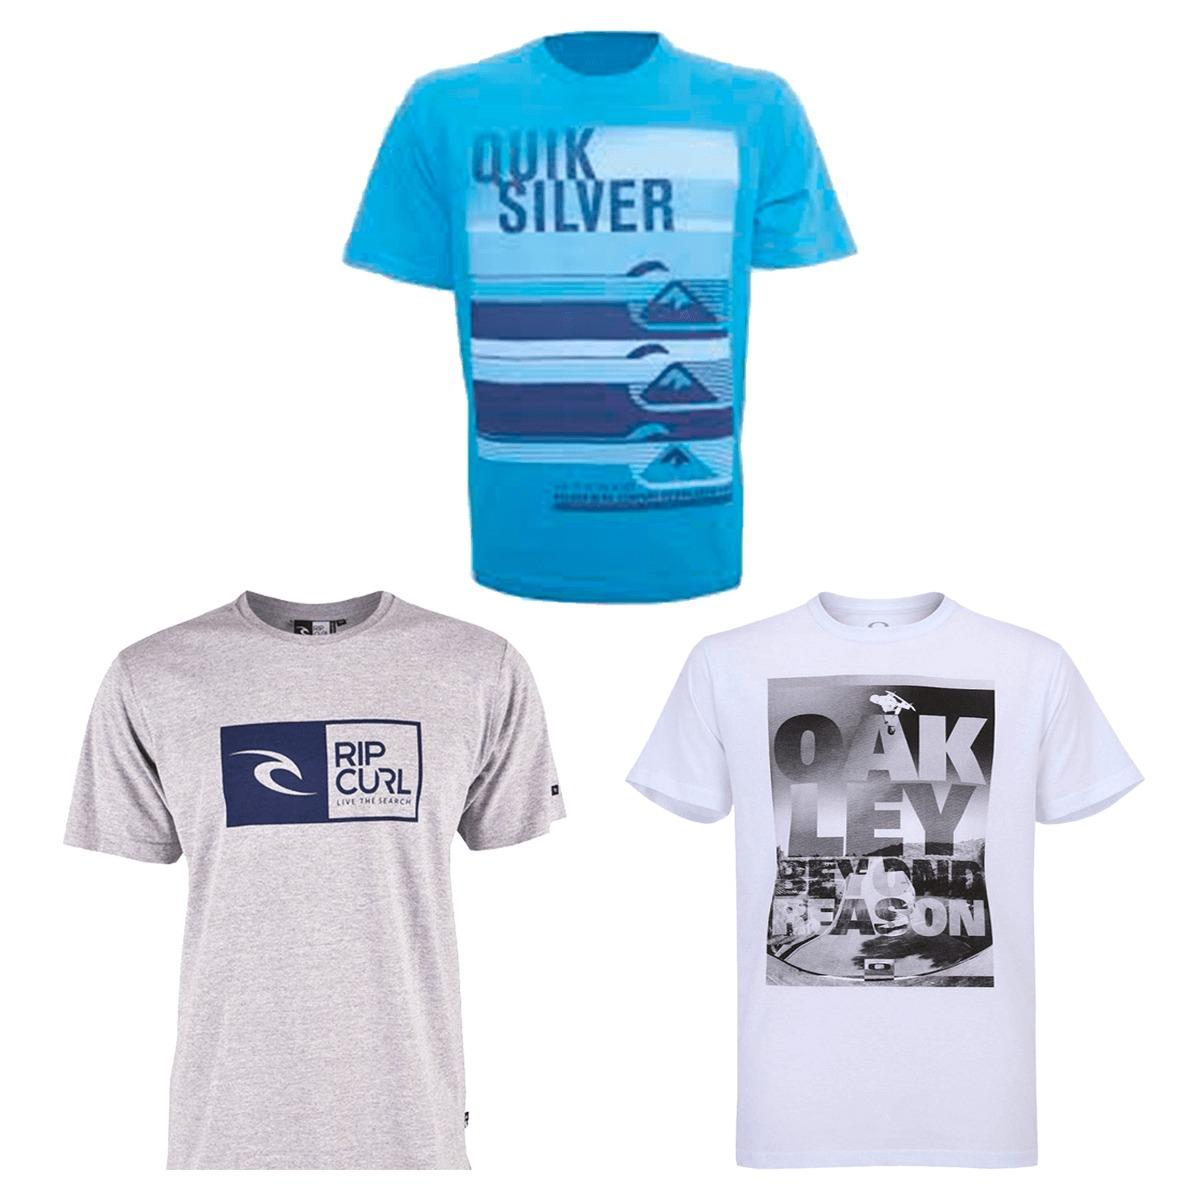 7eb0427561ff9 kit 50 camisa camiseta masculina marca estampada top. Carregando zoom.